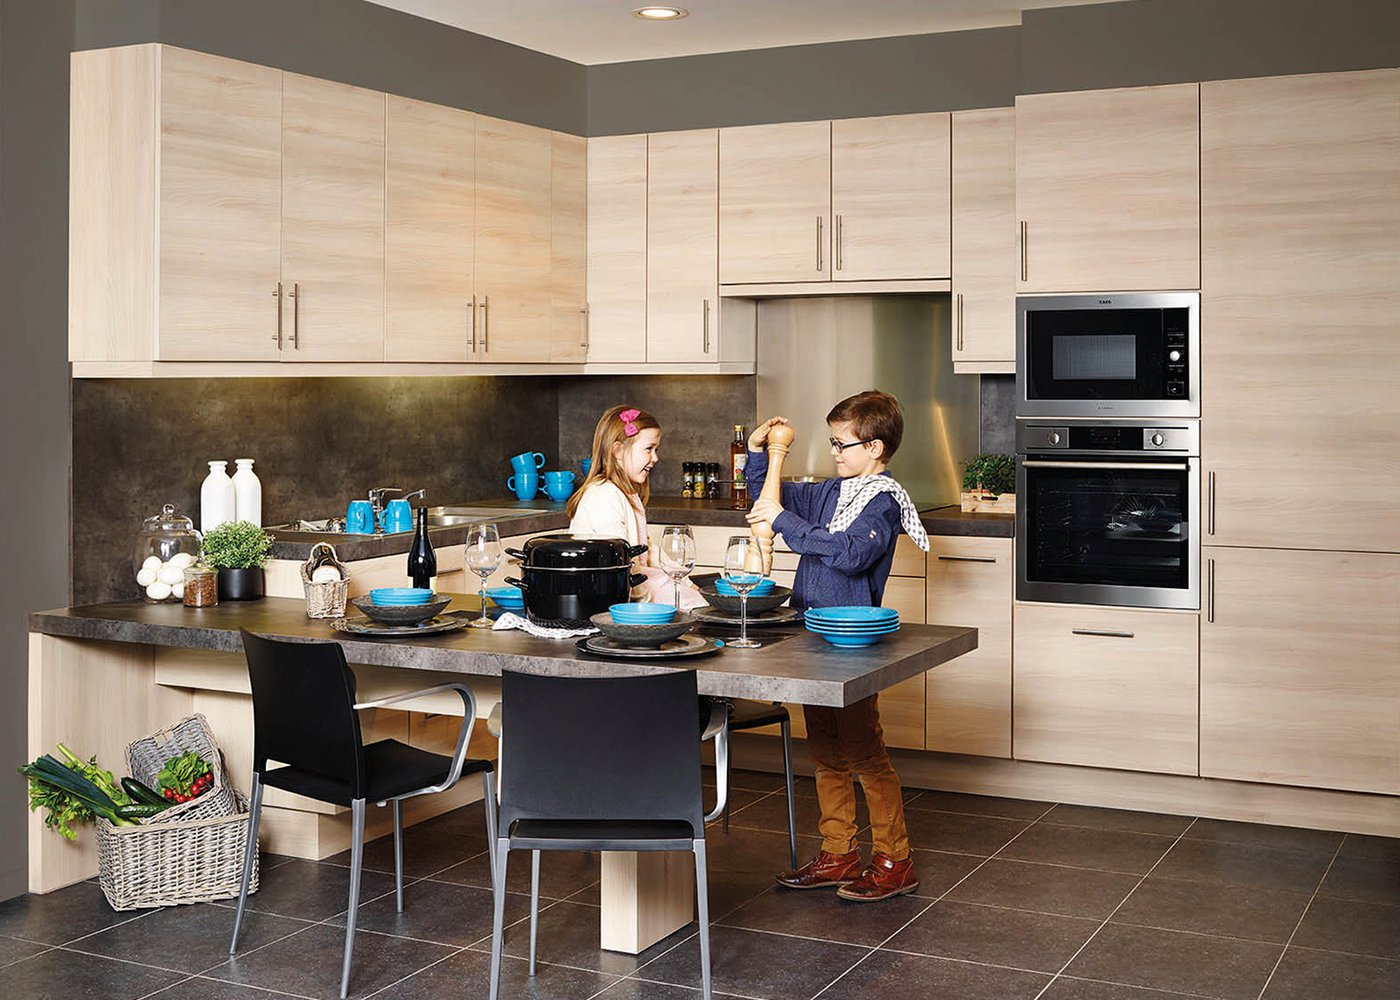 Moderne keuken volledig in laminaat - Model Toronto